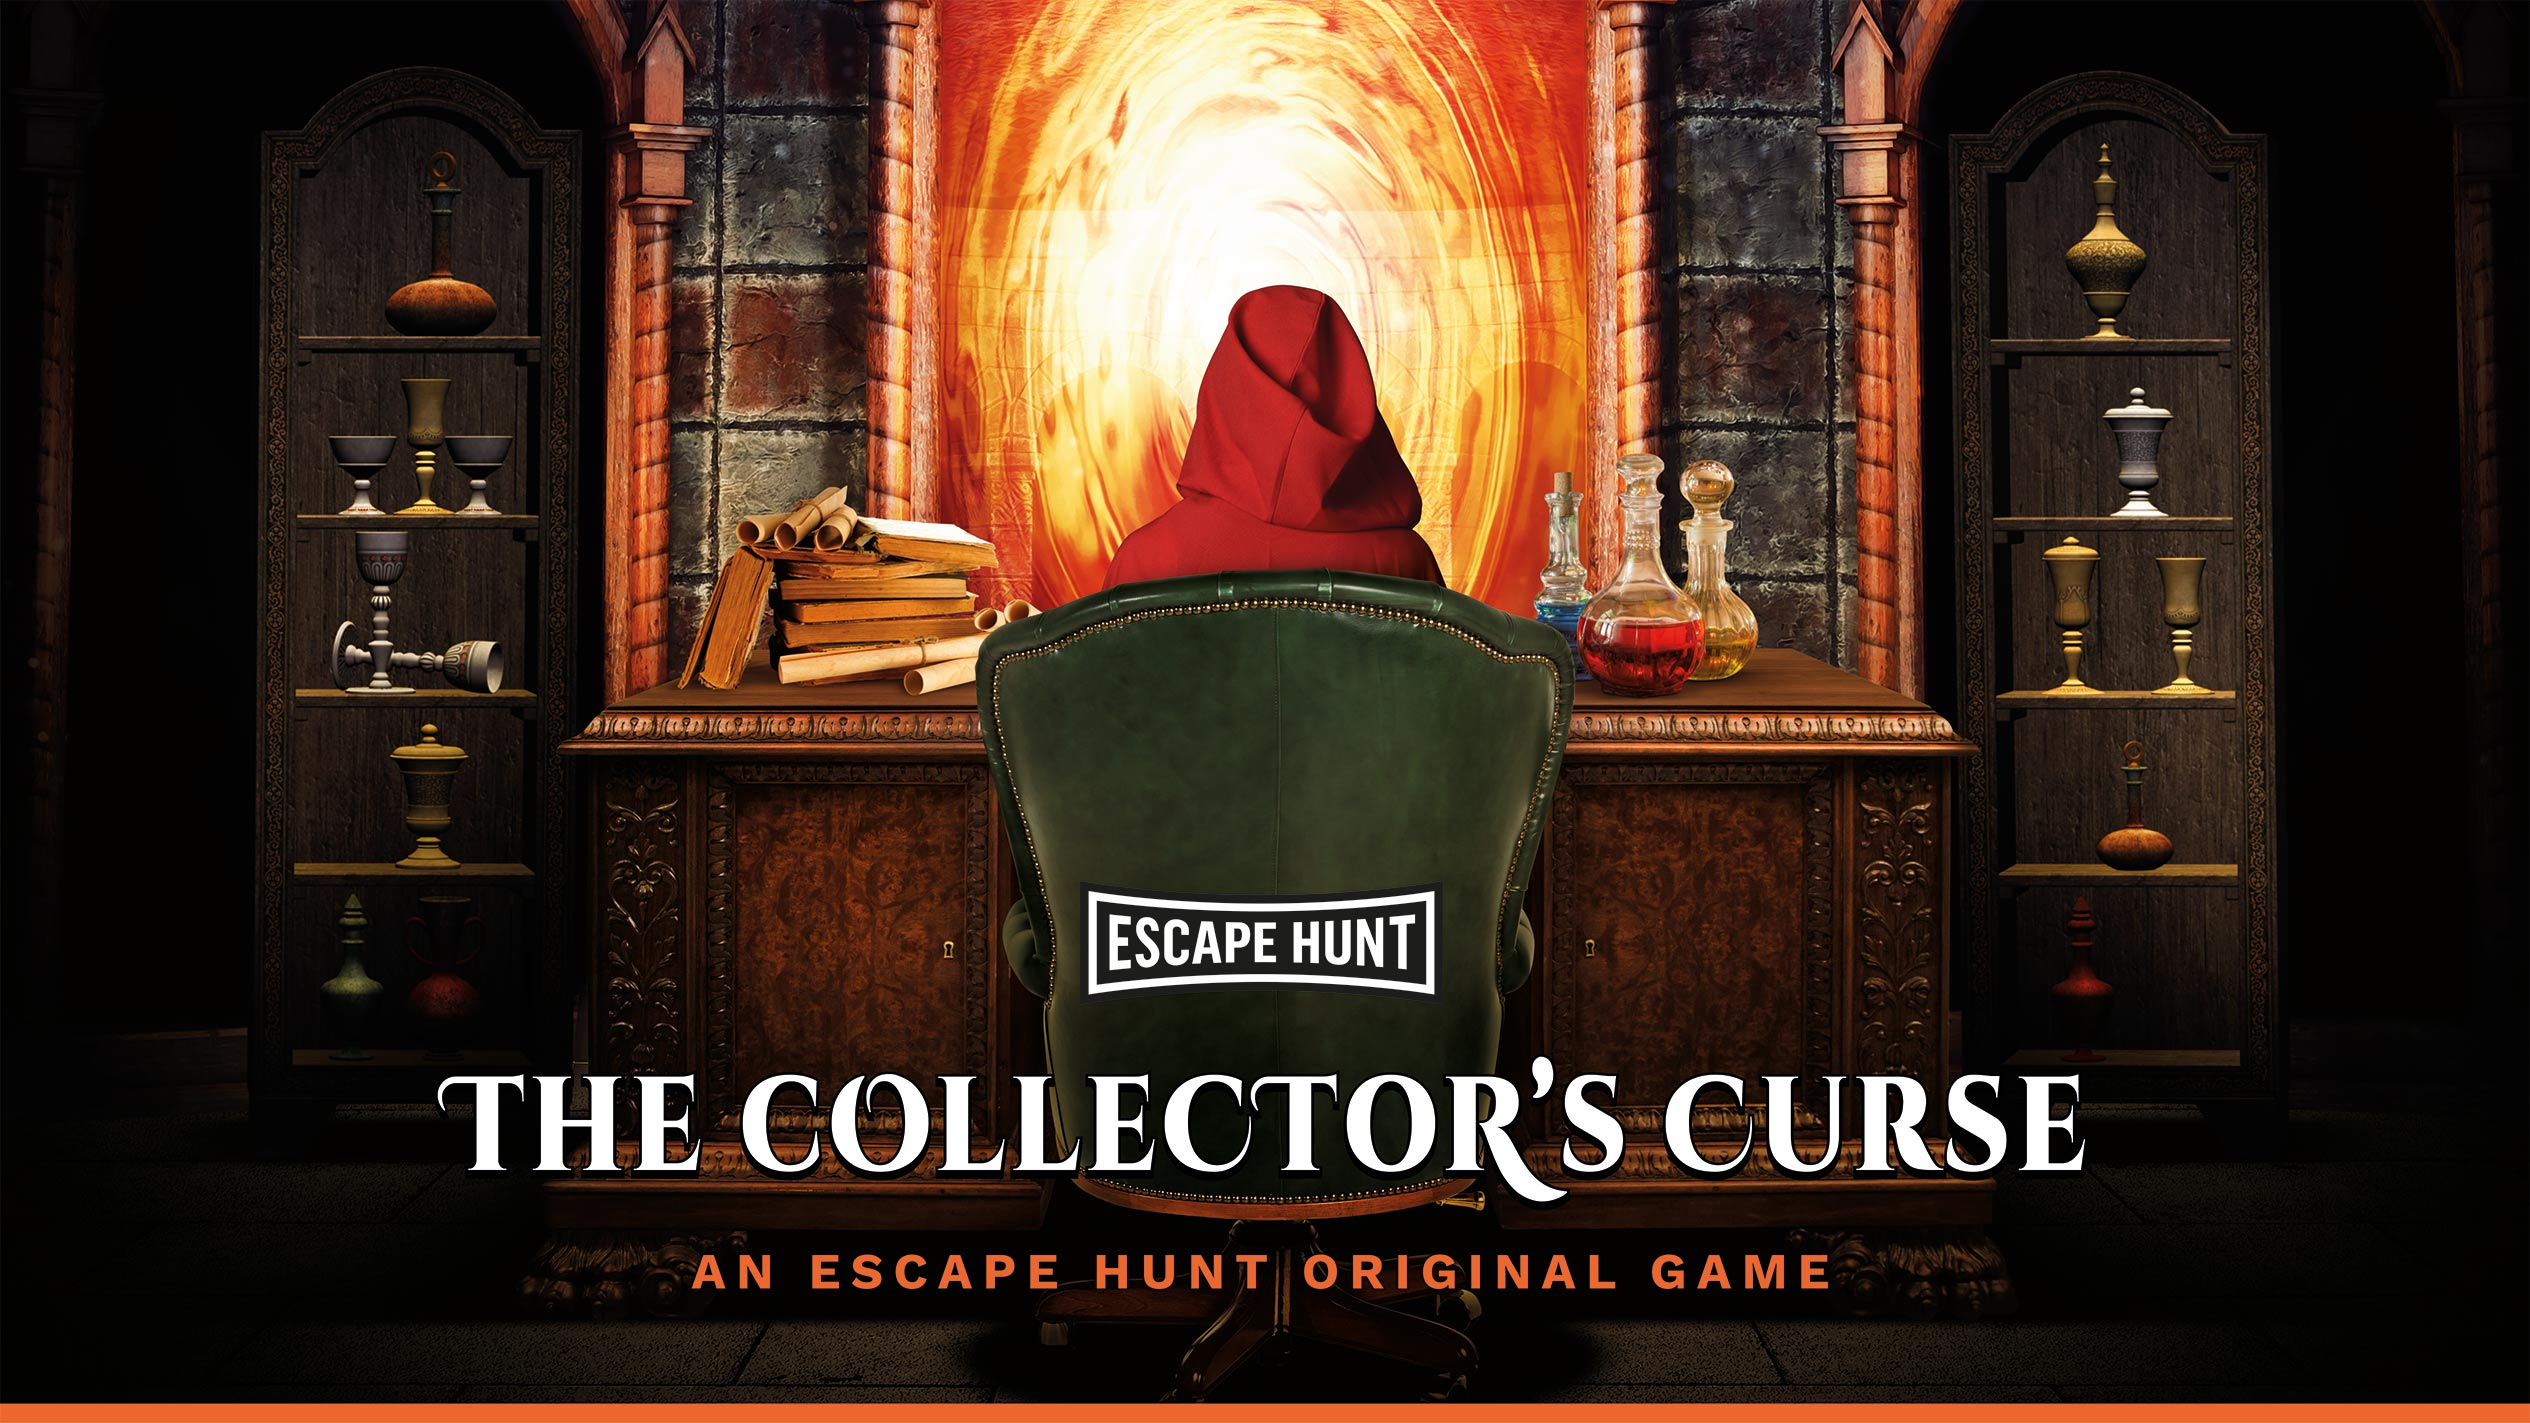 The Collectors Curse Live Escape Room Game Escape Hunt Adelaide